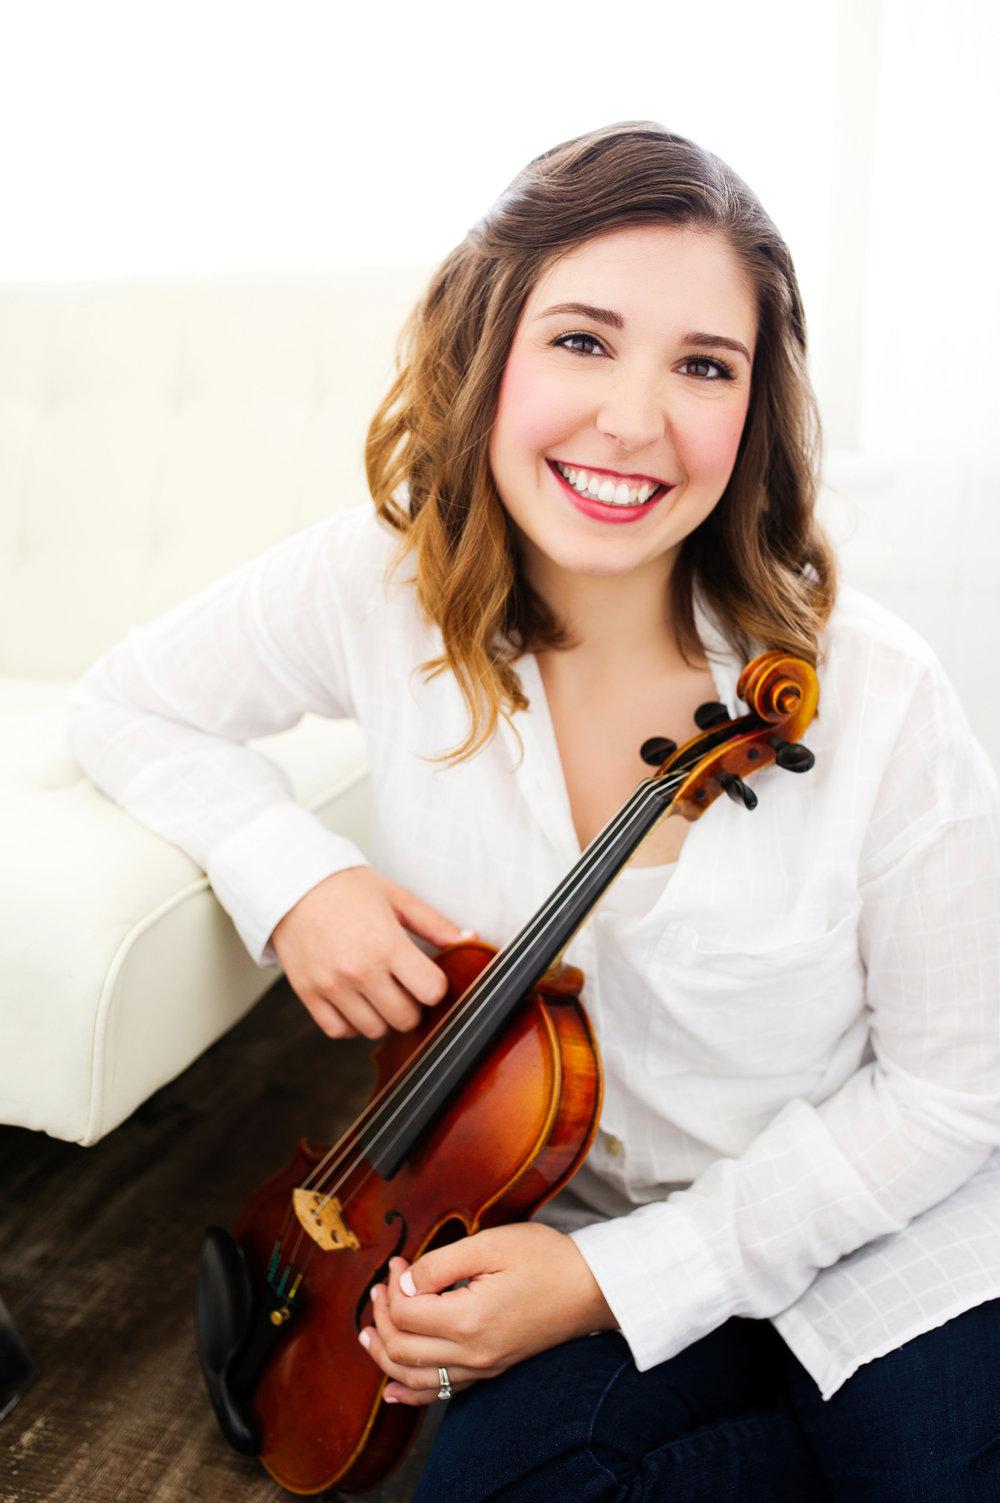 Abigail Peterson, Violin Teacher and Owner of Abellimento Violin Studio | Suzuki Violin Lessons, Milwaukee, WI